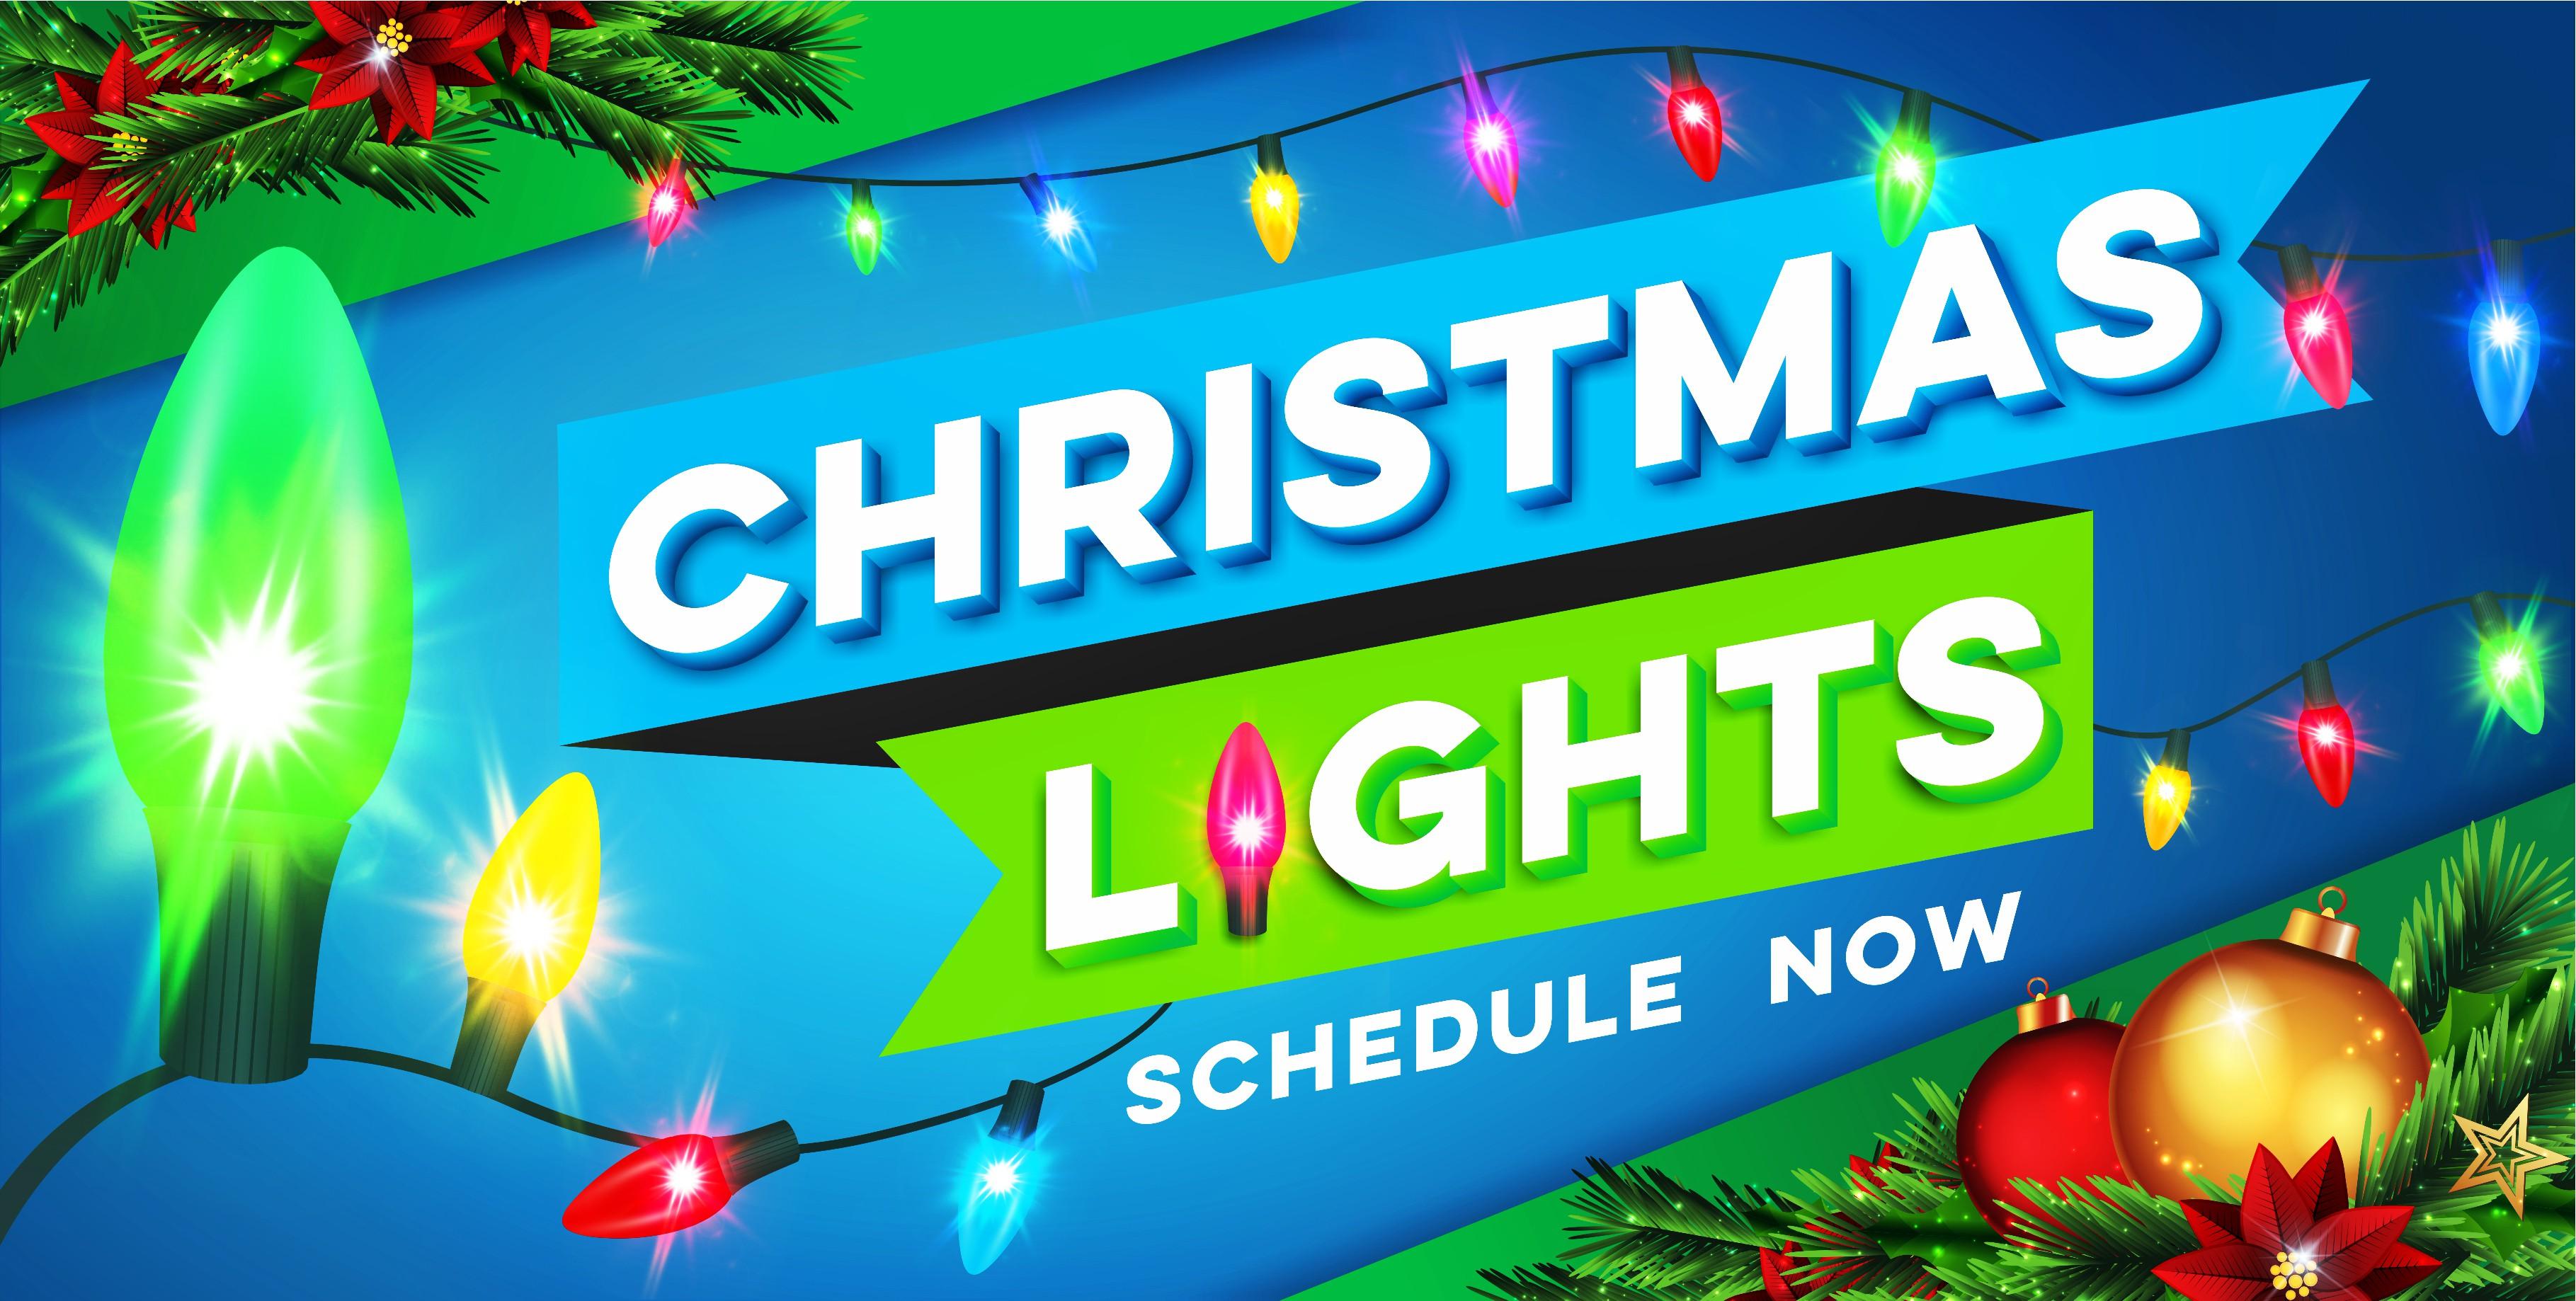 Chorbie Christmas Lights Door Ad 2019